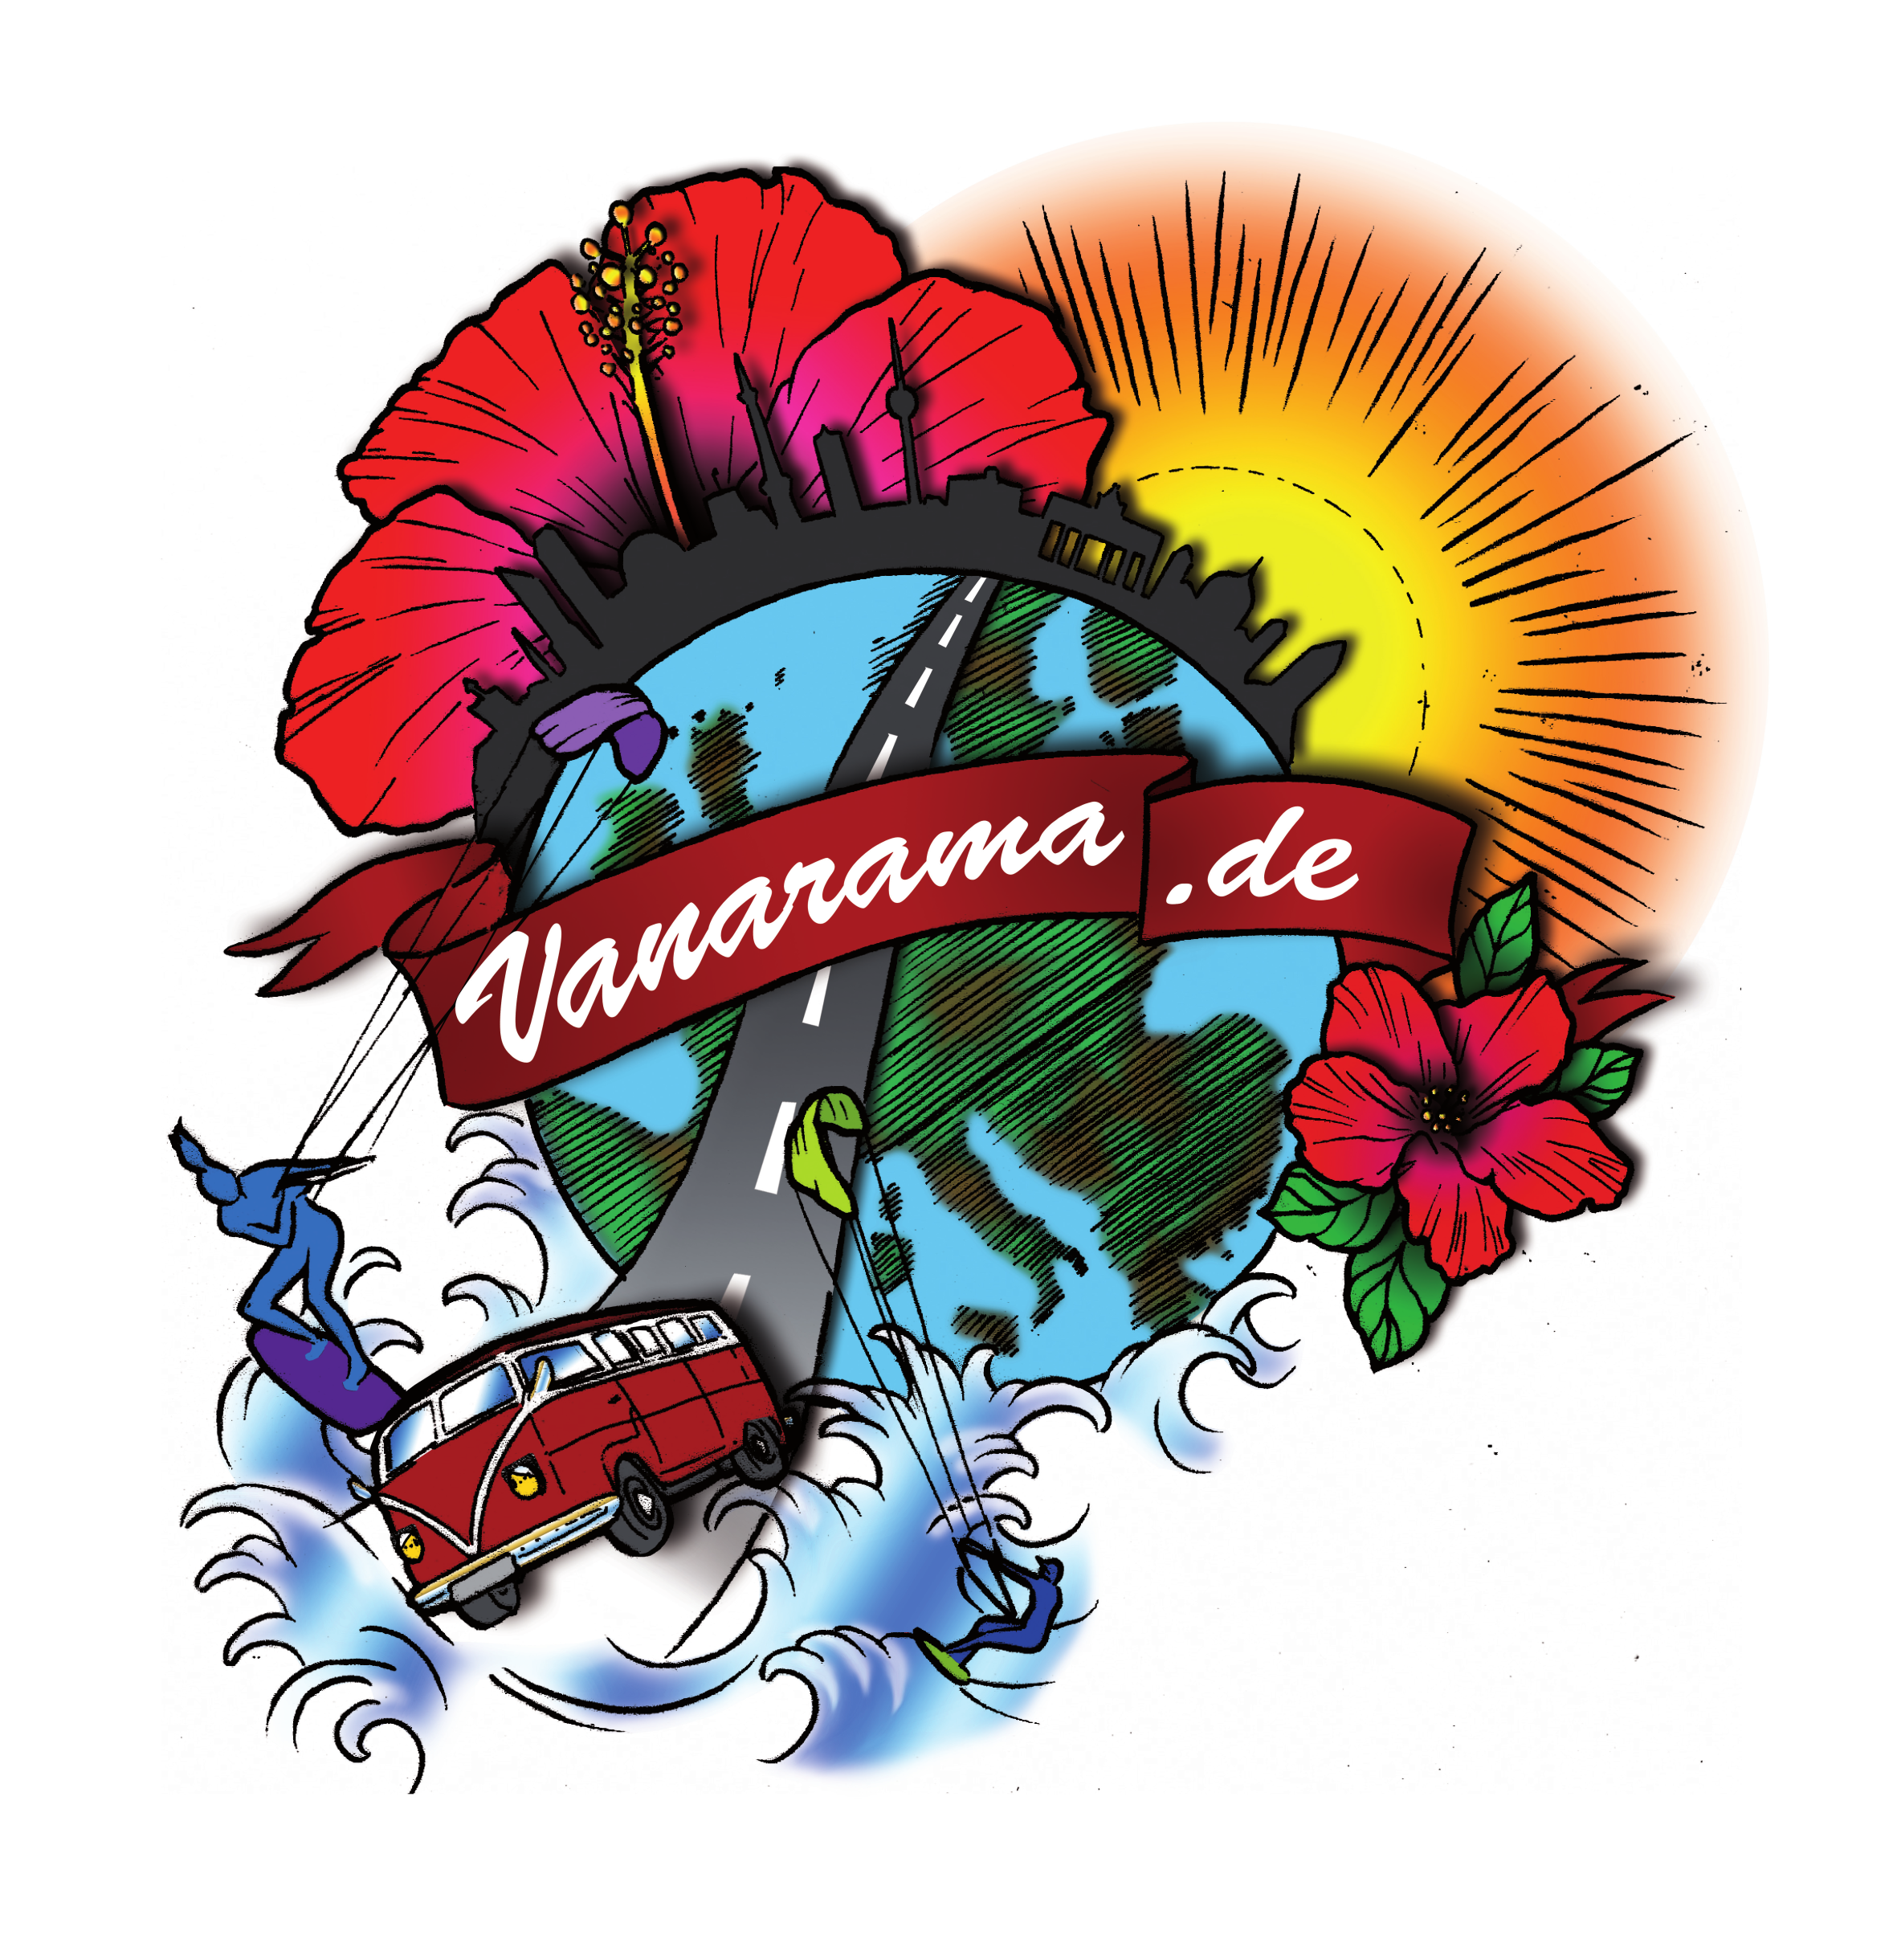 Campervermietung Vanarama